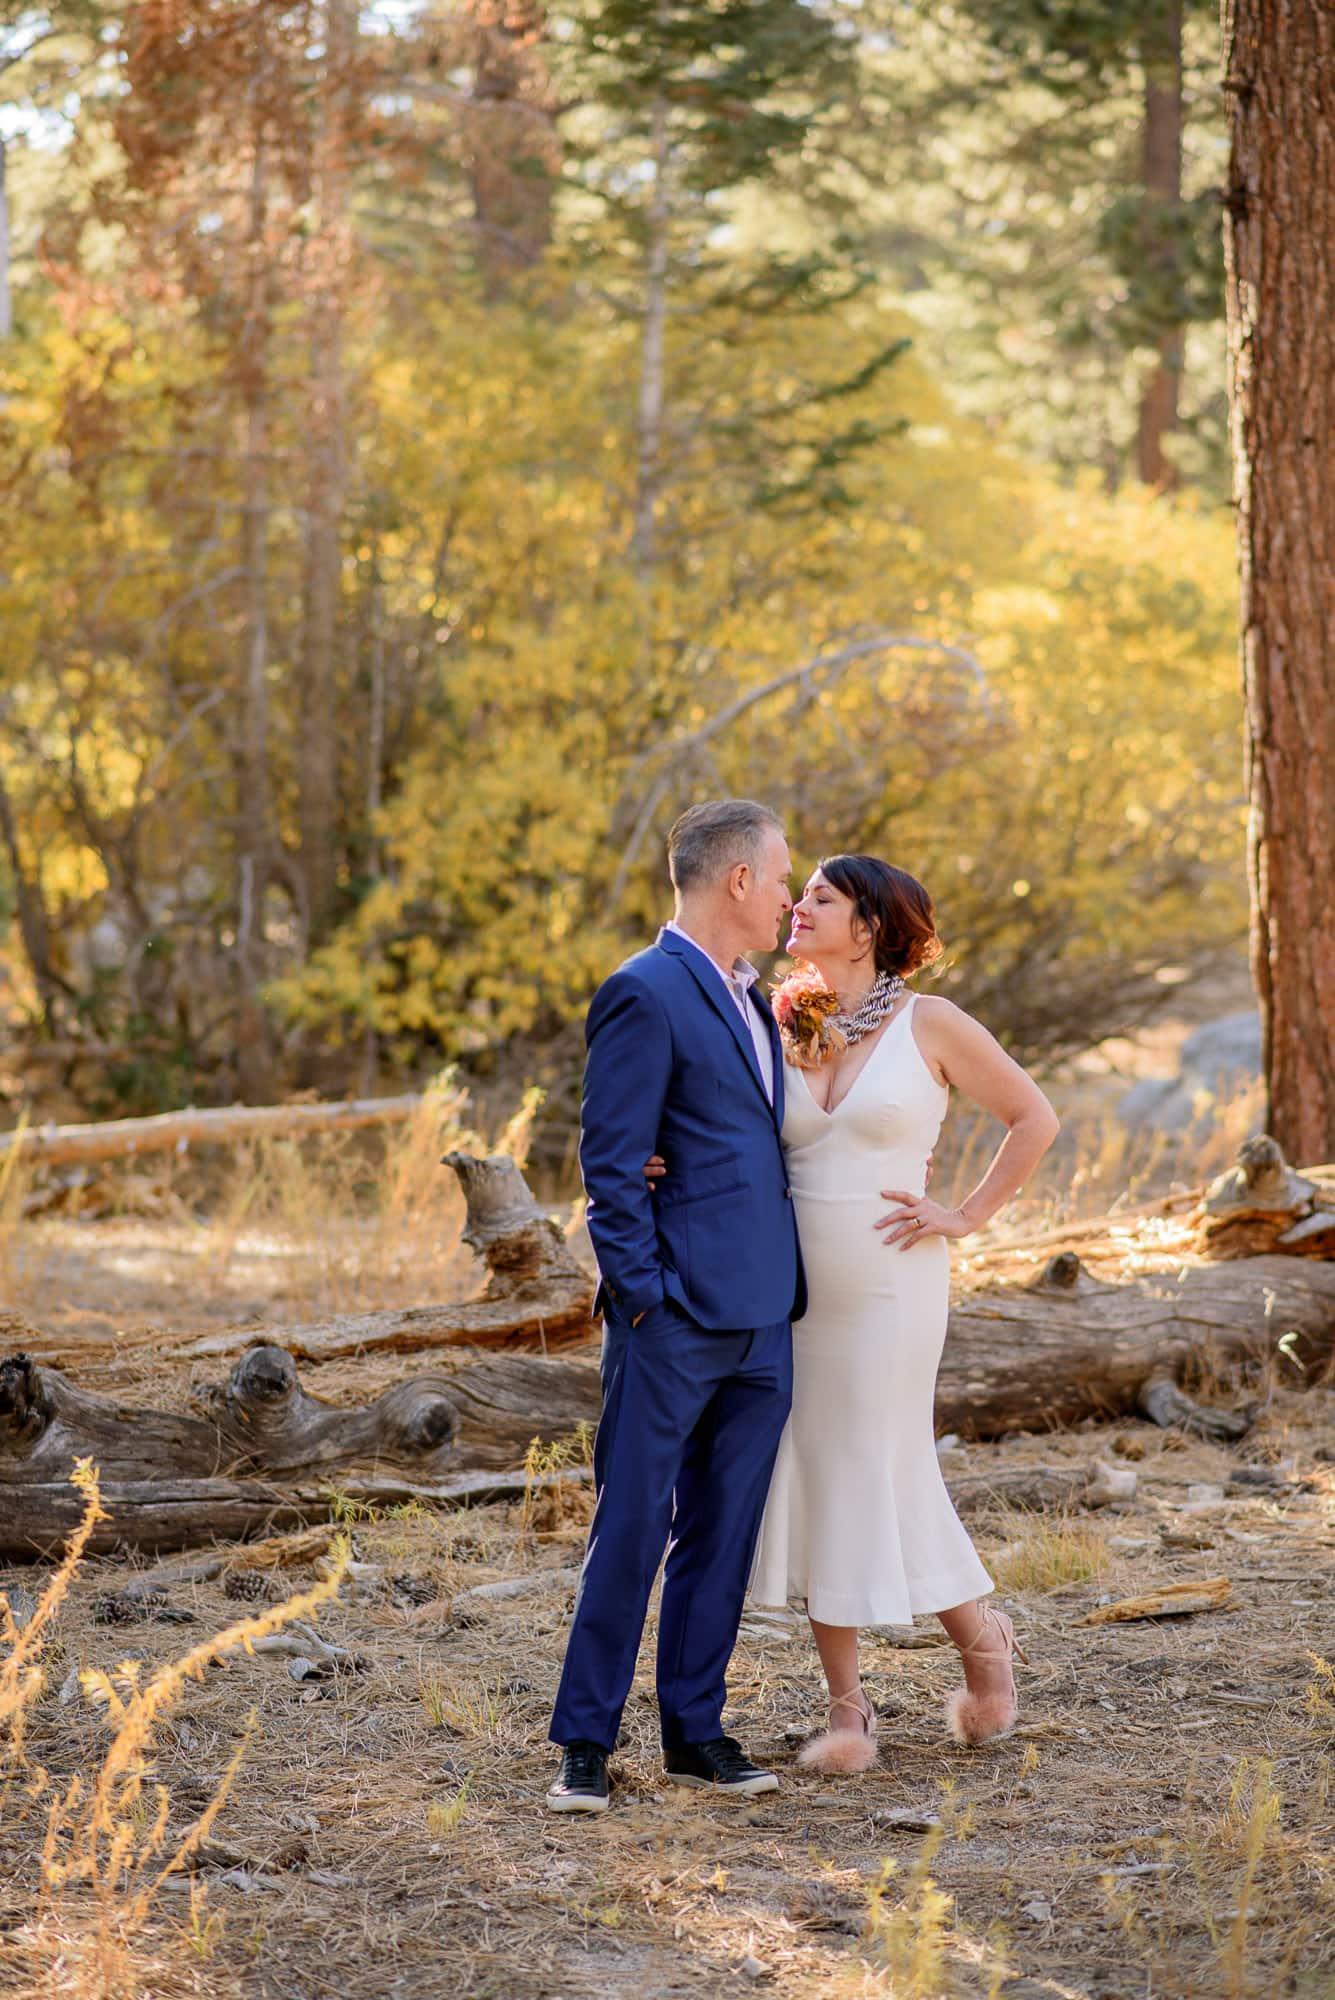 033_Alan_and_Heidi_Palm_Springs_Tram_Wedding